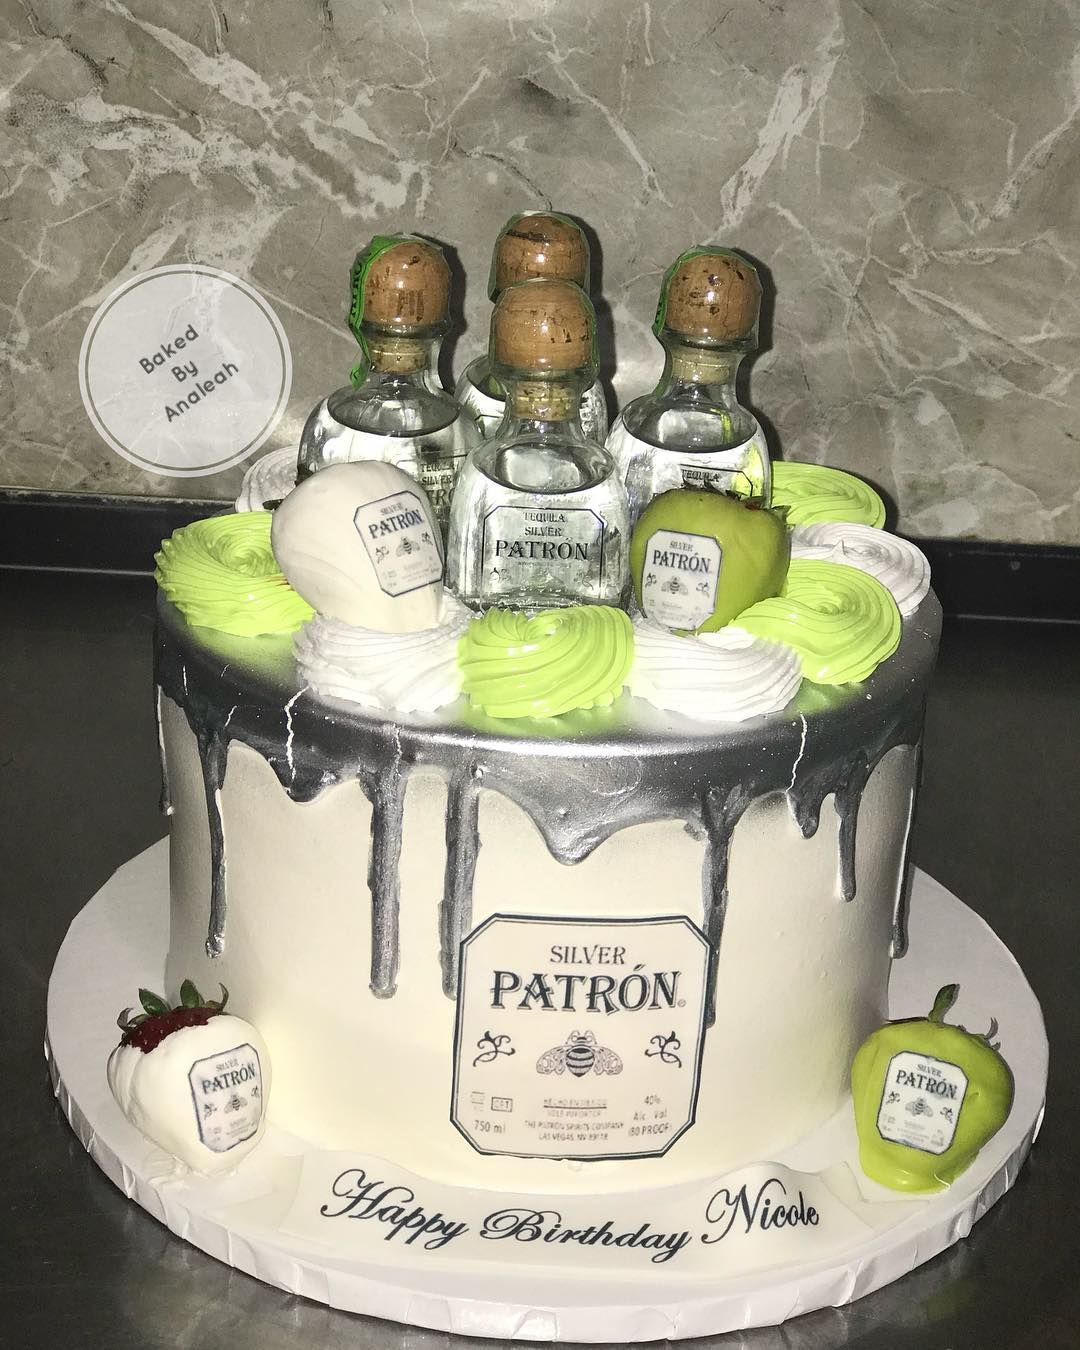 Phenomenal Tequila Patron Themed Cake Bakedbyanaleah Bizcochodominicano Funny Birthday Cards Online Elaedamsfinfo